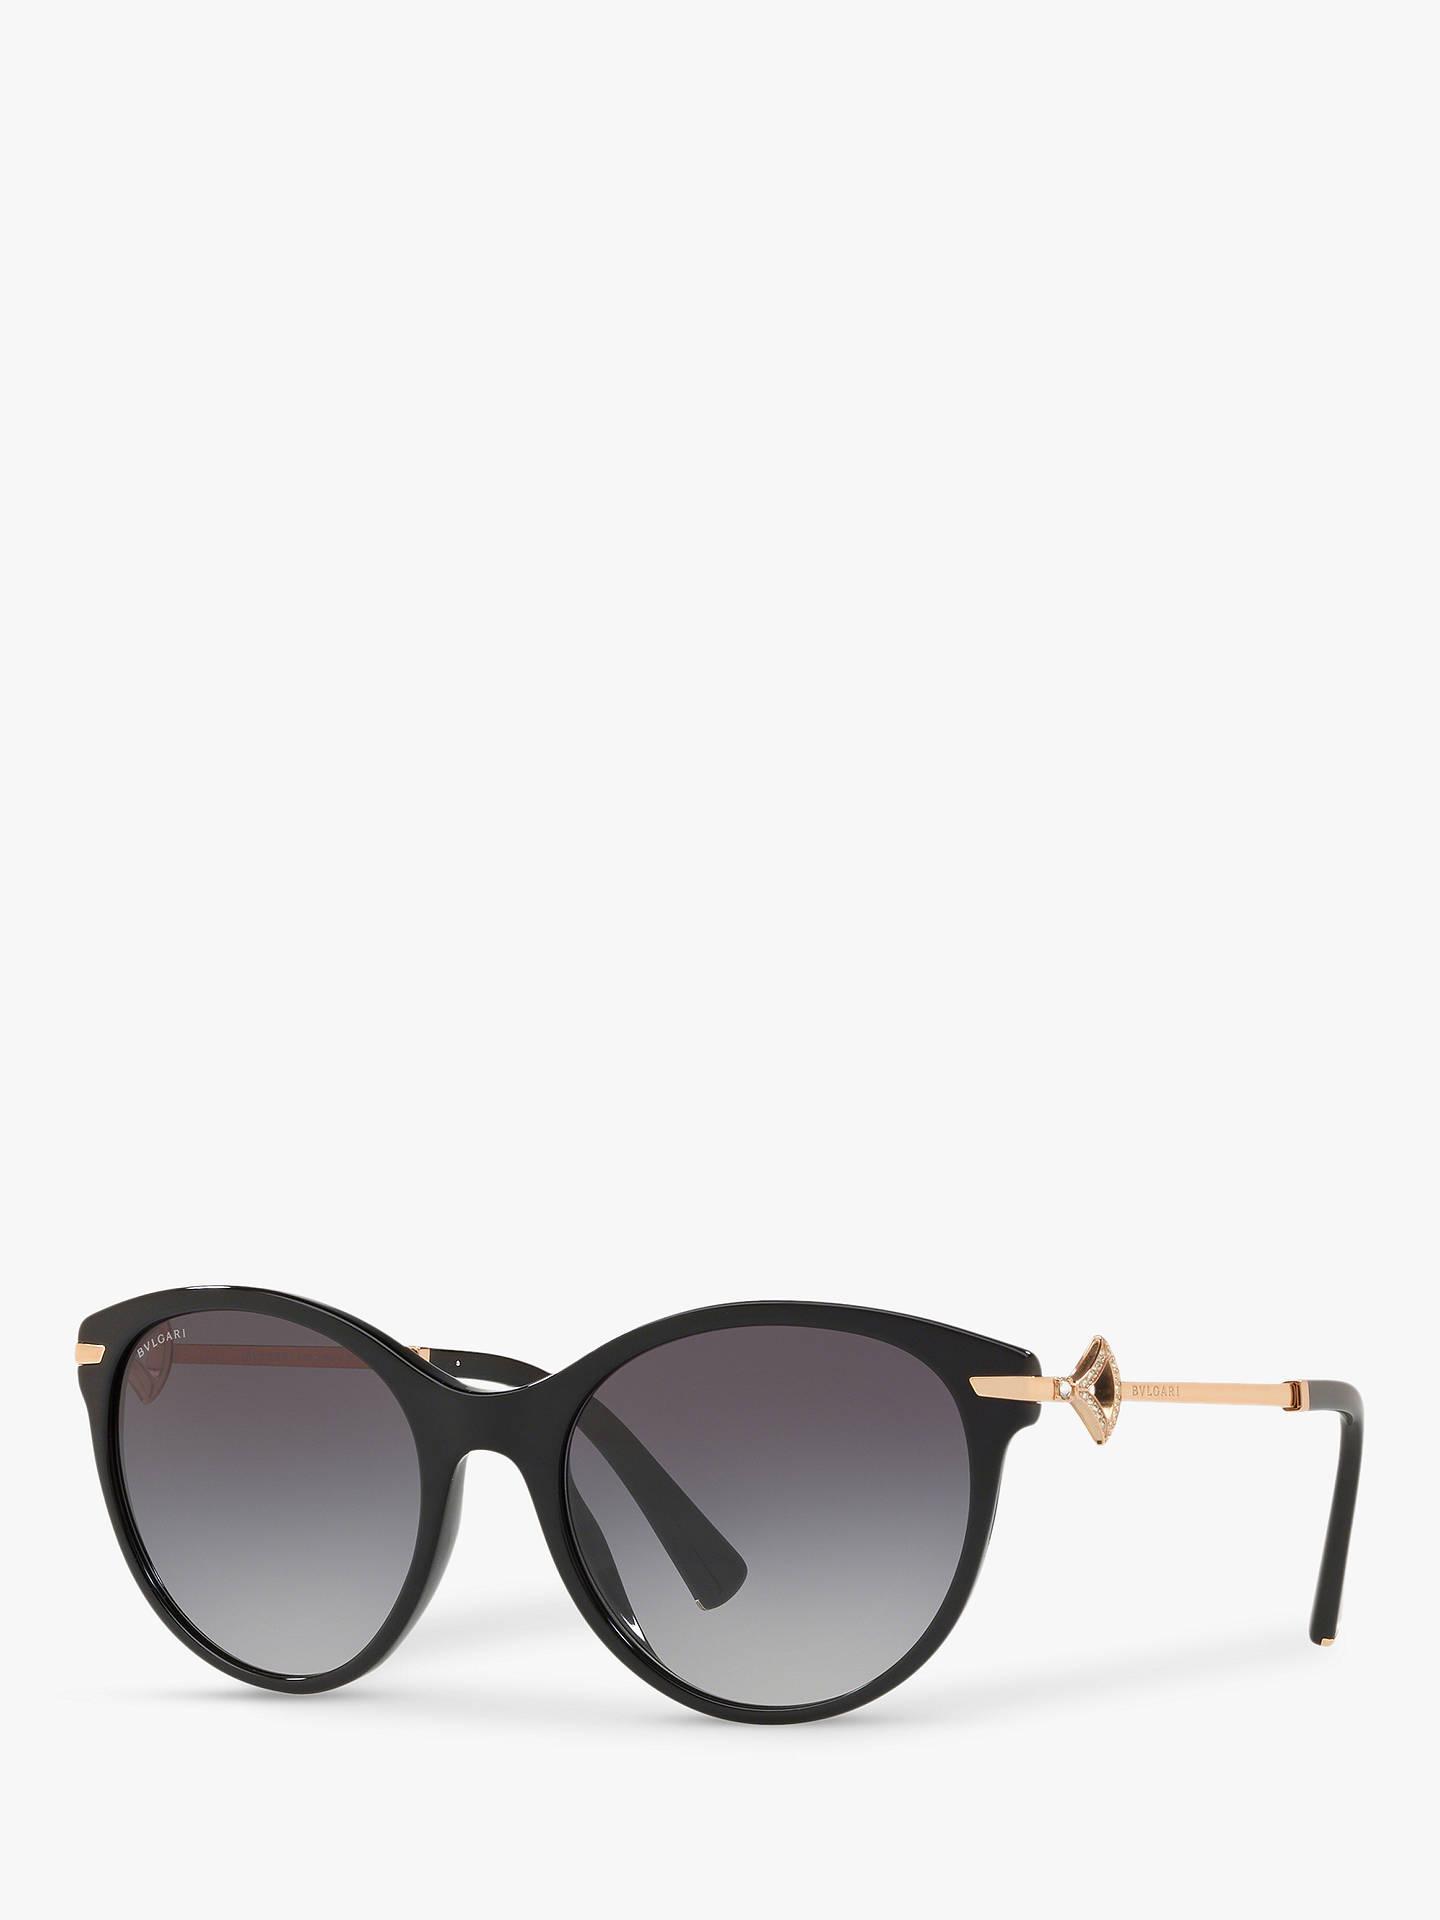 dec5d5c873d85 BVLGARI BV8210B Embellished Cat s Eye Sunglasses